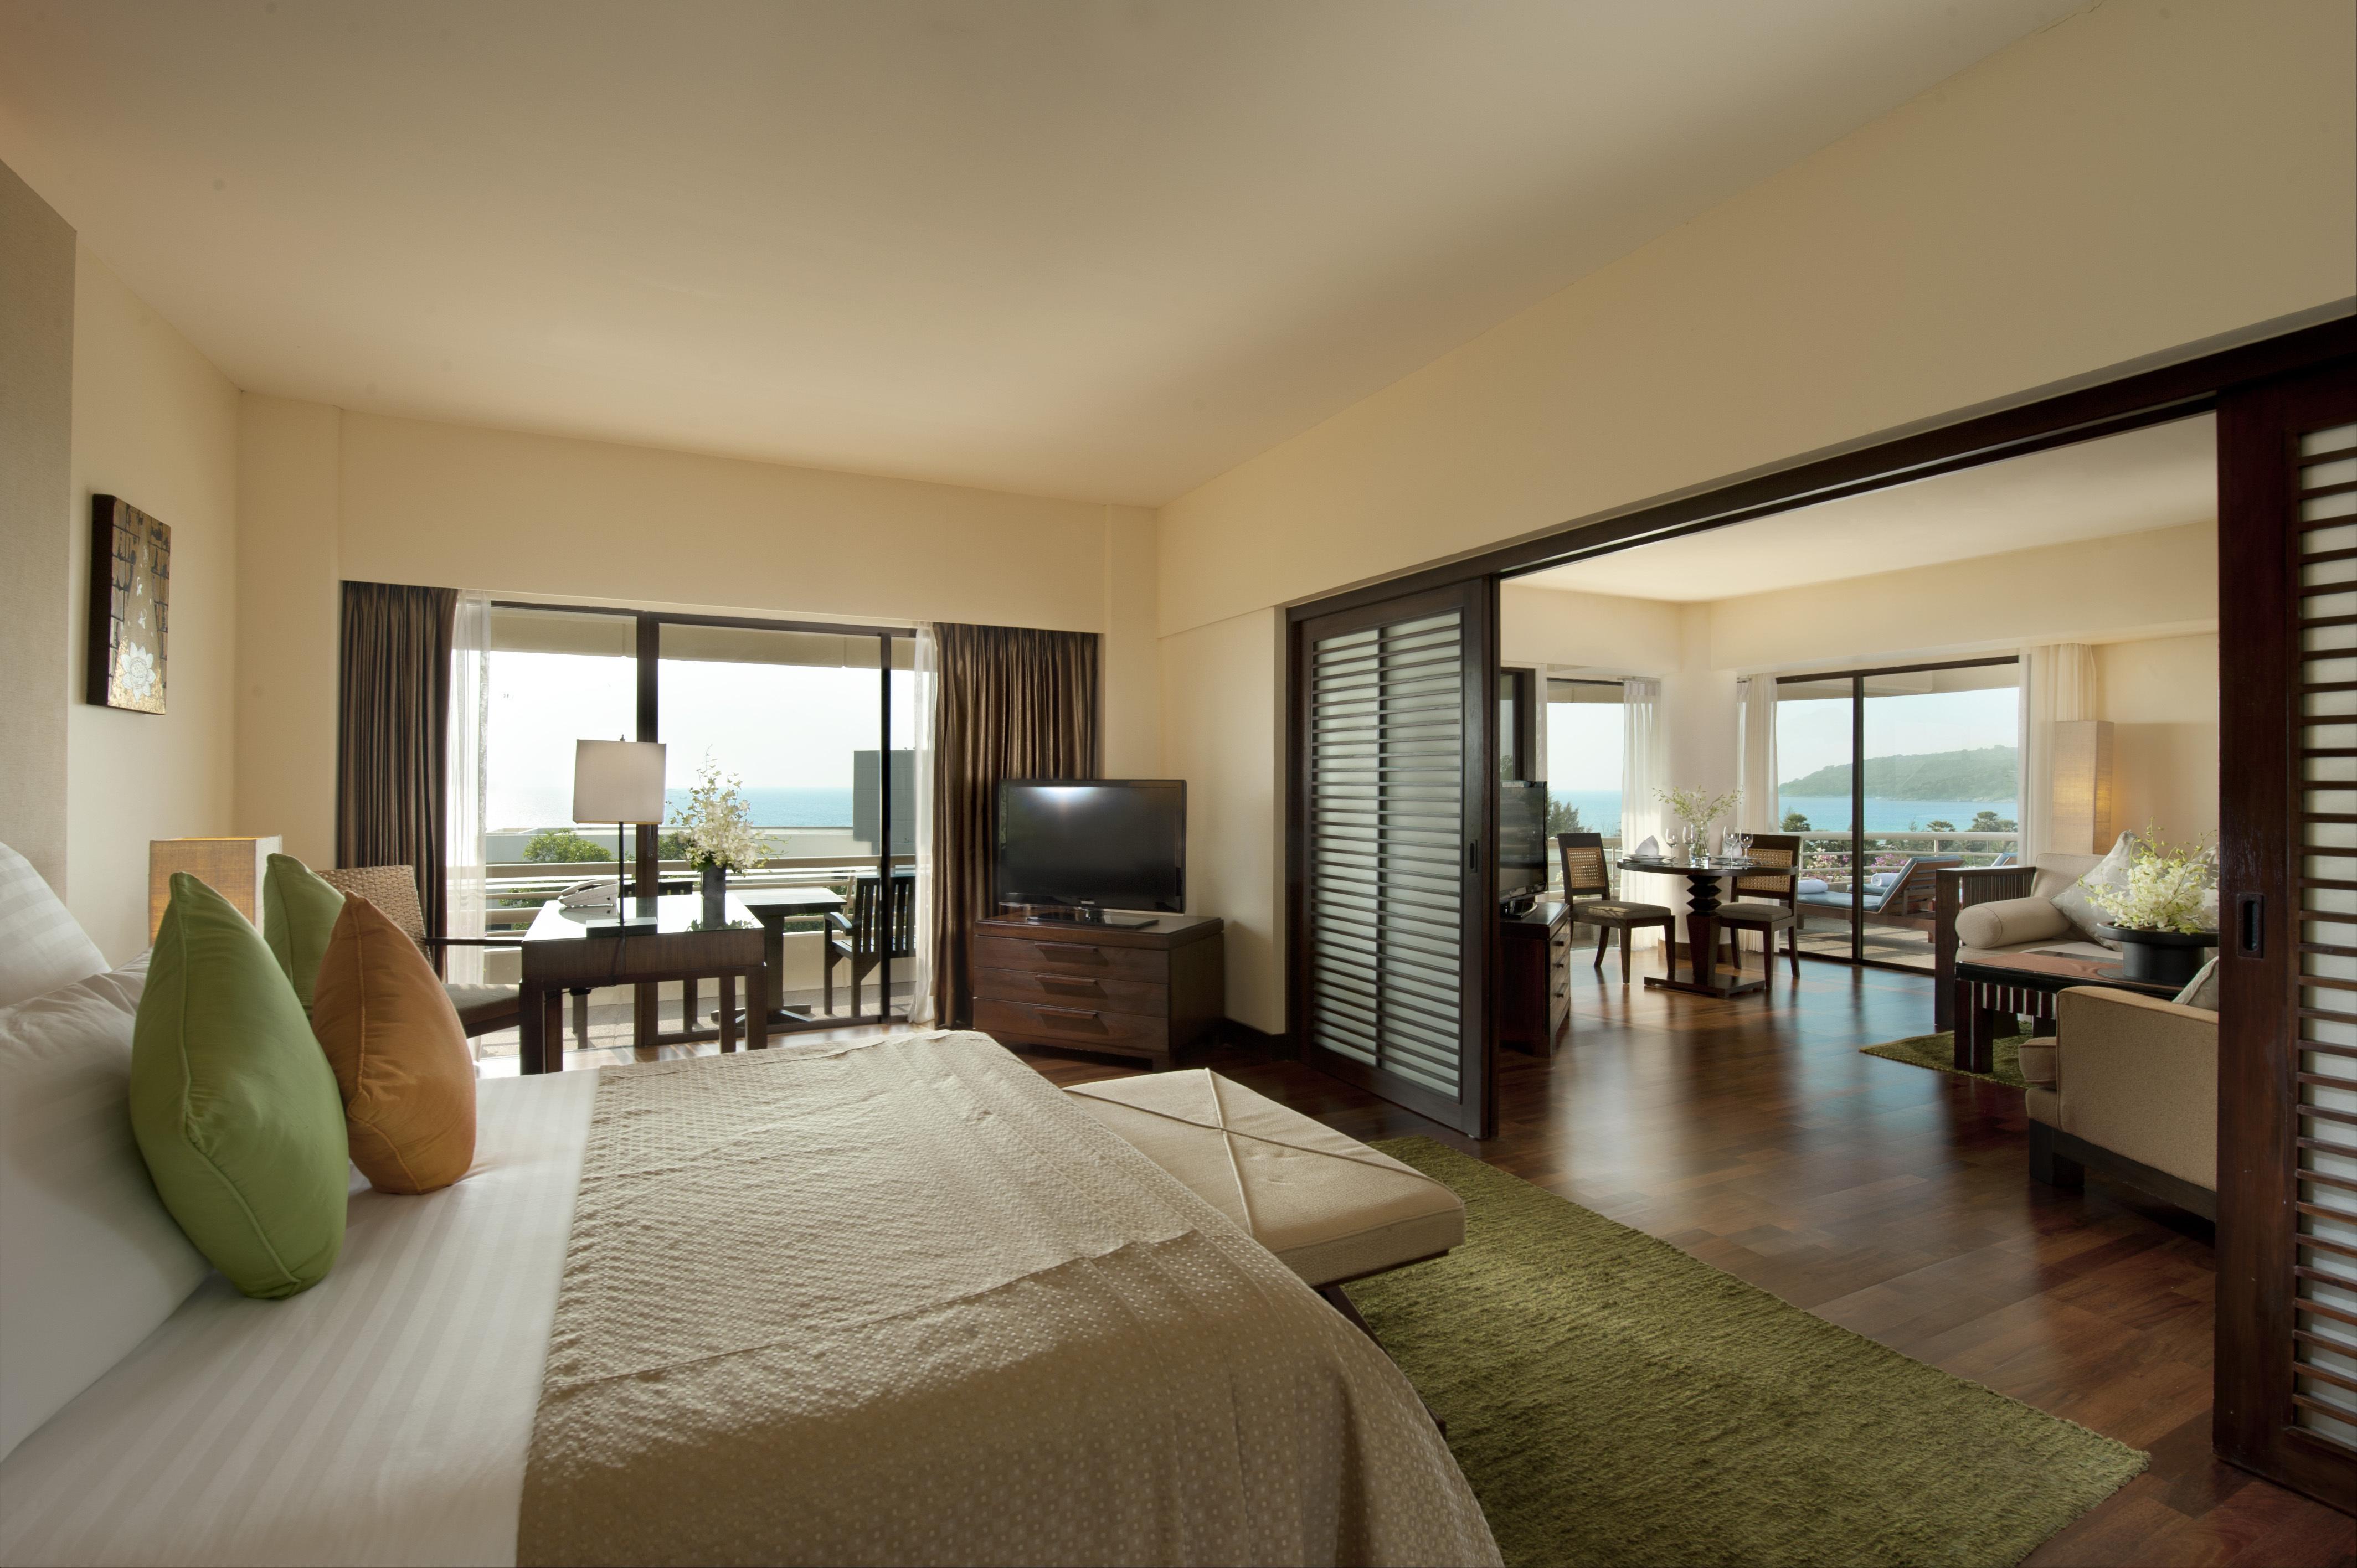 Hilton hotel bedroom